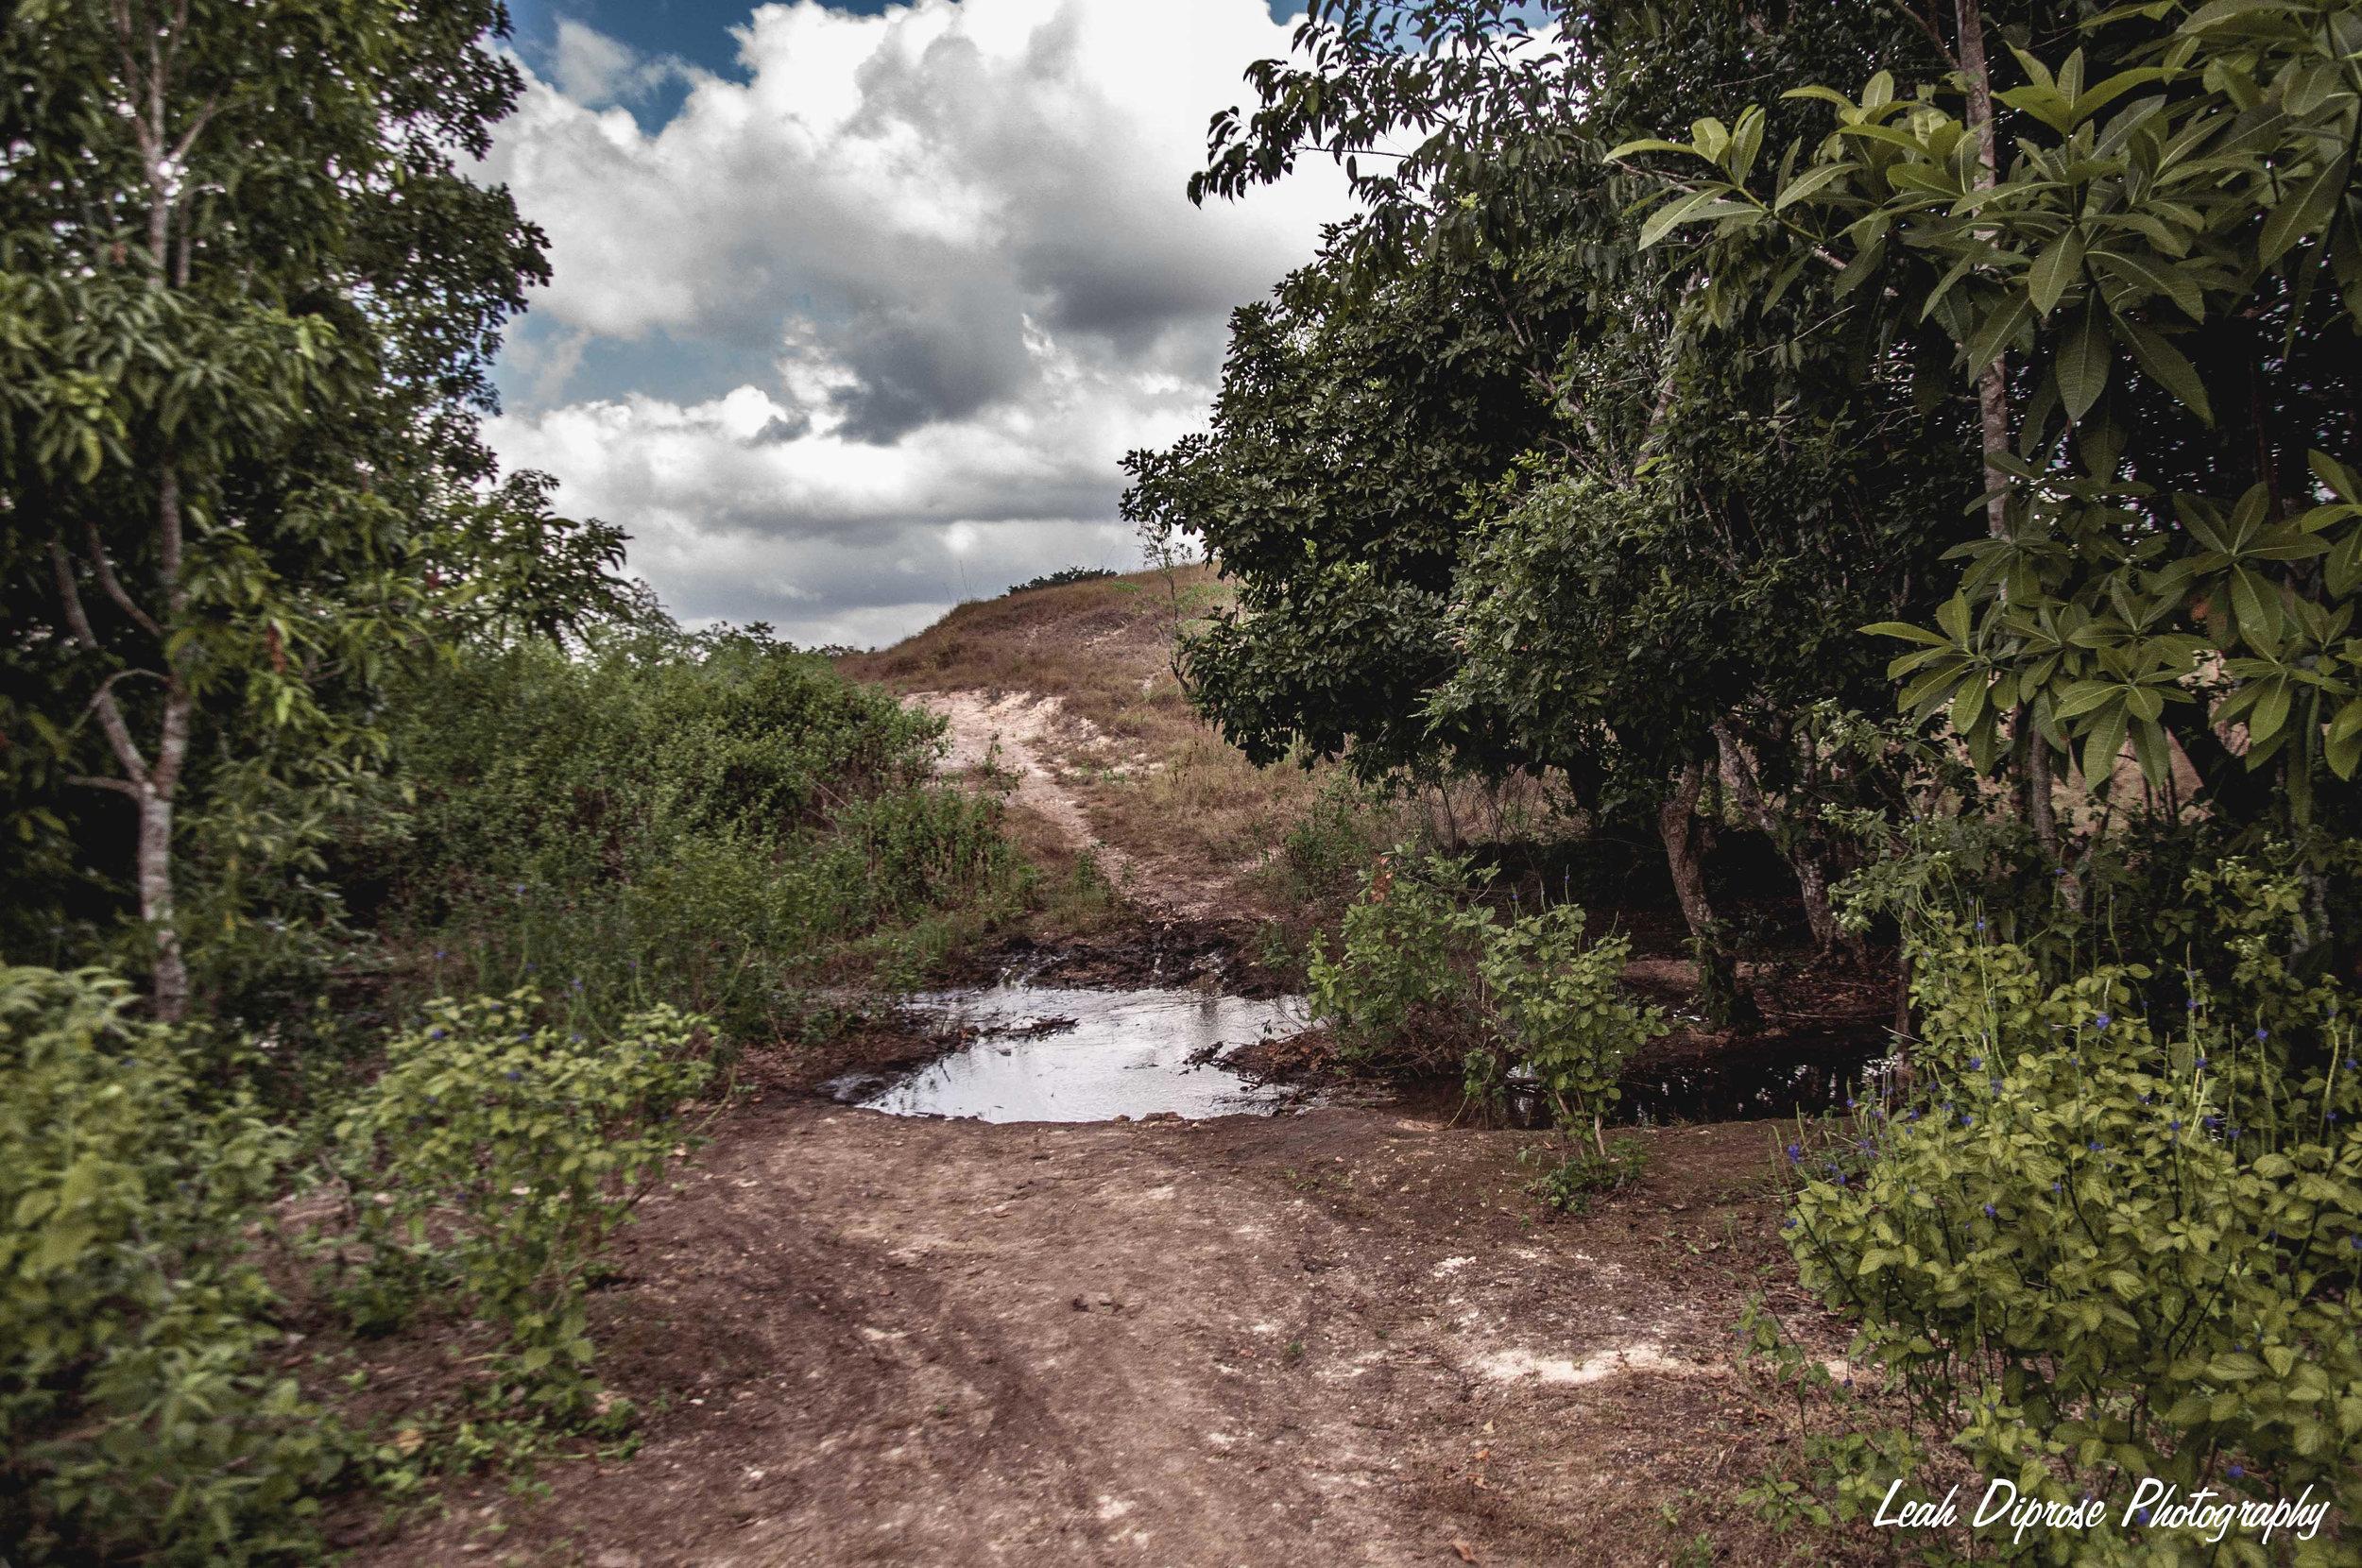 Leah Diprose Photography image-5330.jpg